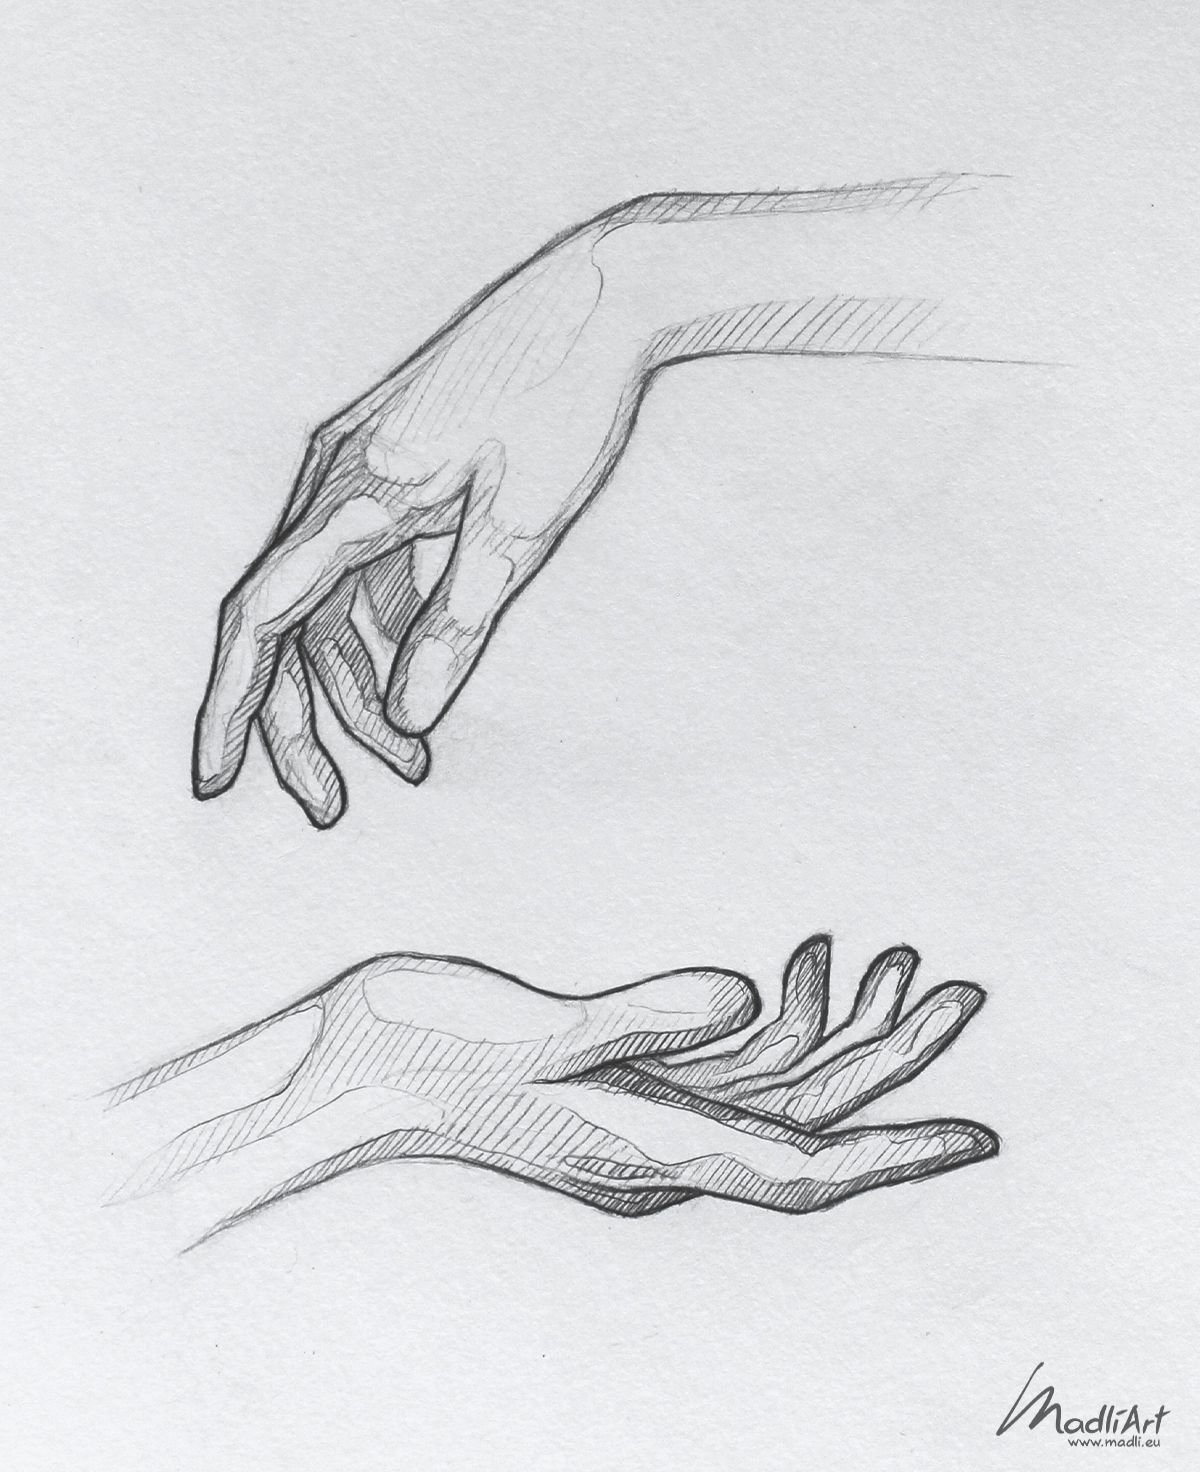 Sketchy line art - hands study